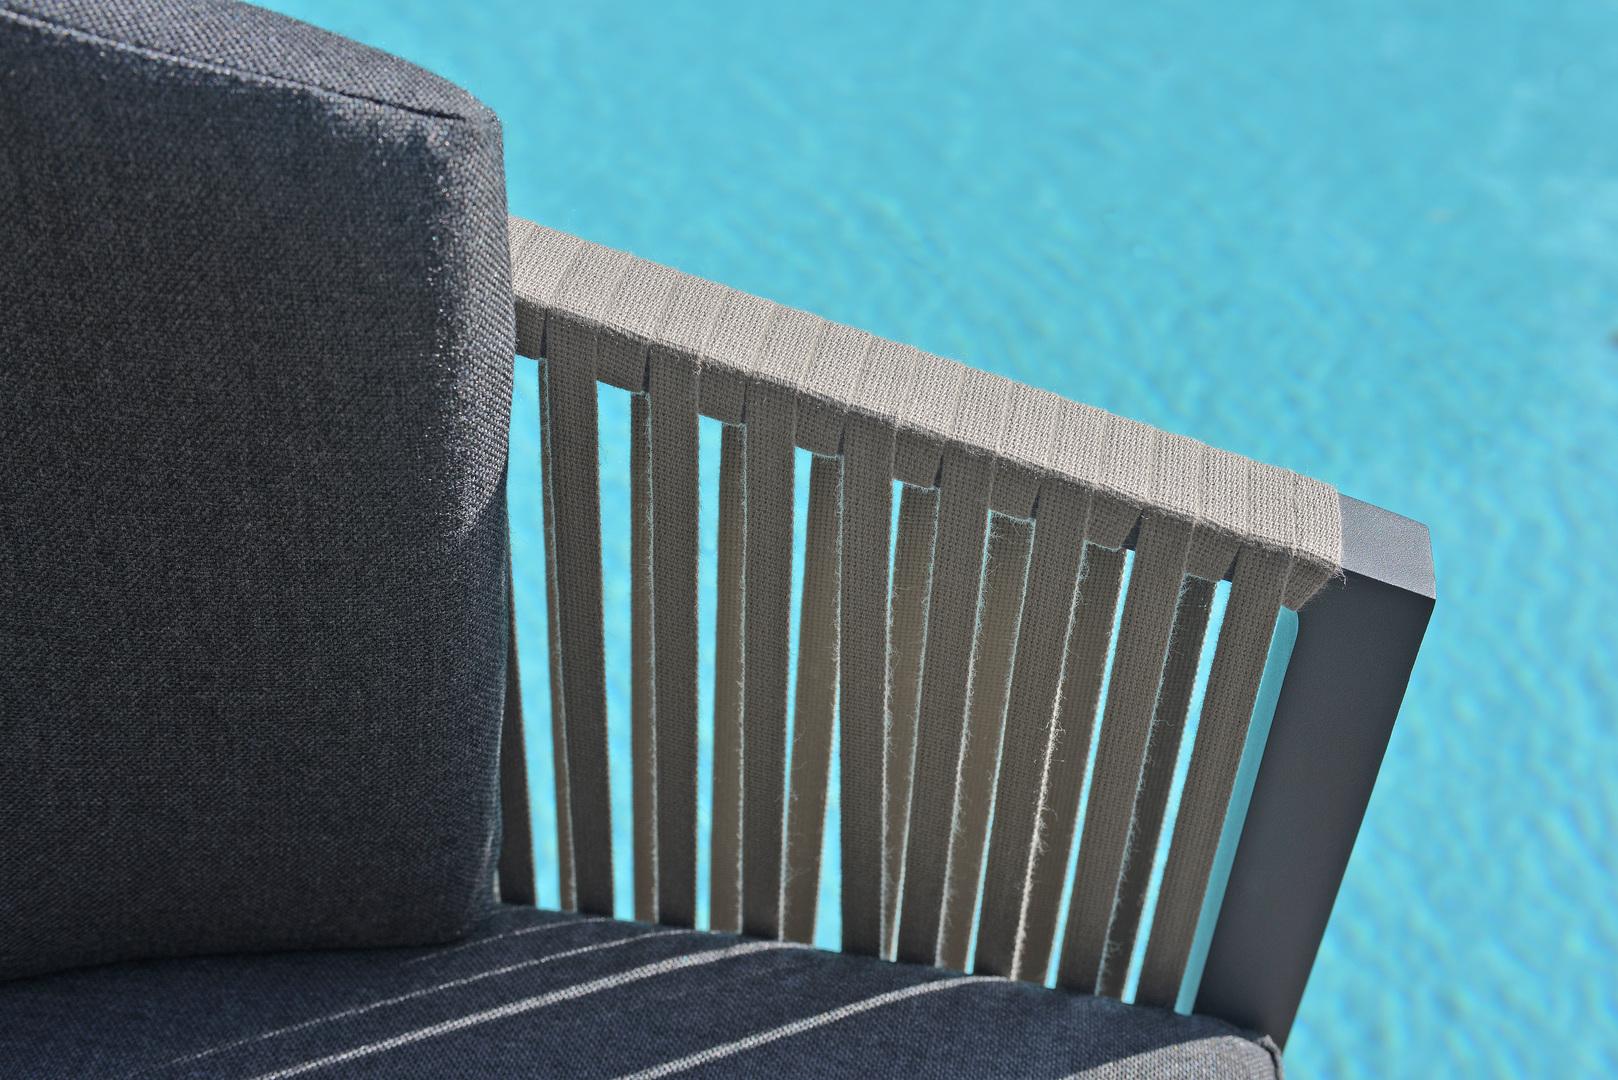 2018 Borek alu belt Cosenza chair Wolterinck detail.jpg